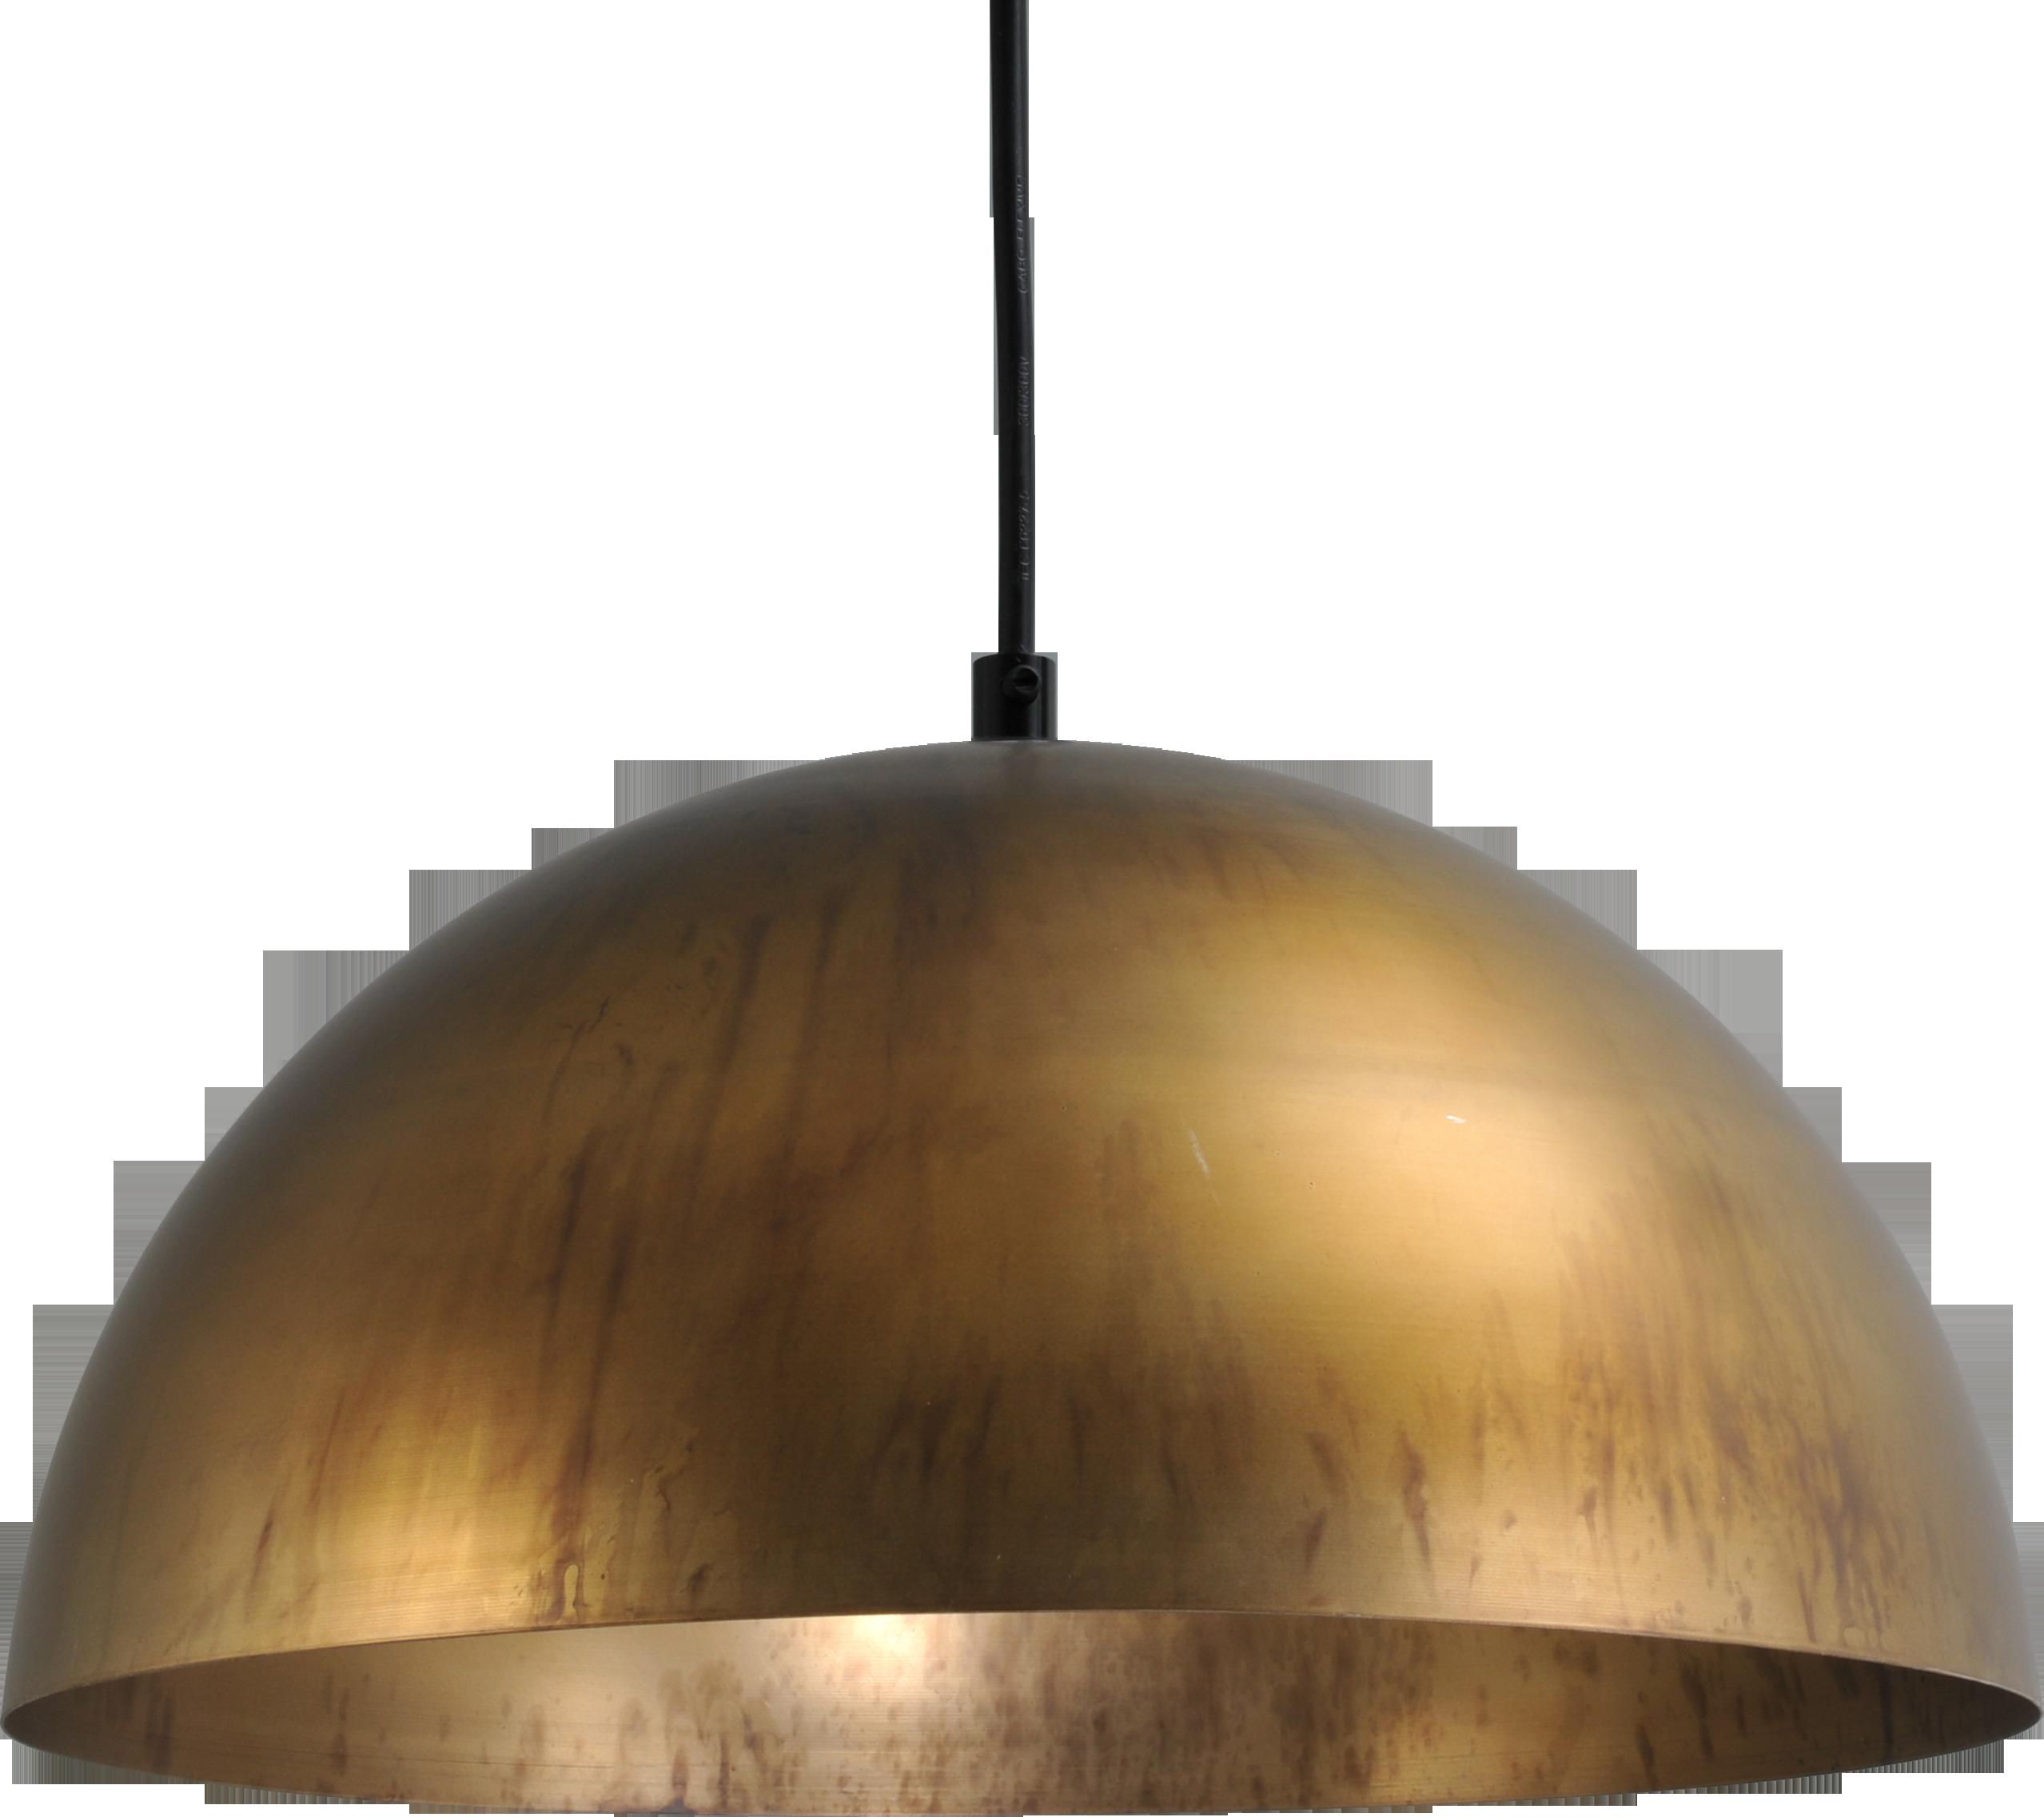 Larino Antique Brass HL LARINO Ø30CM ANTIQUE BRASS OUTSIDE